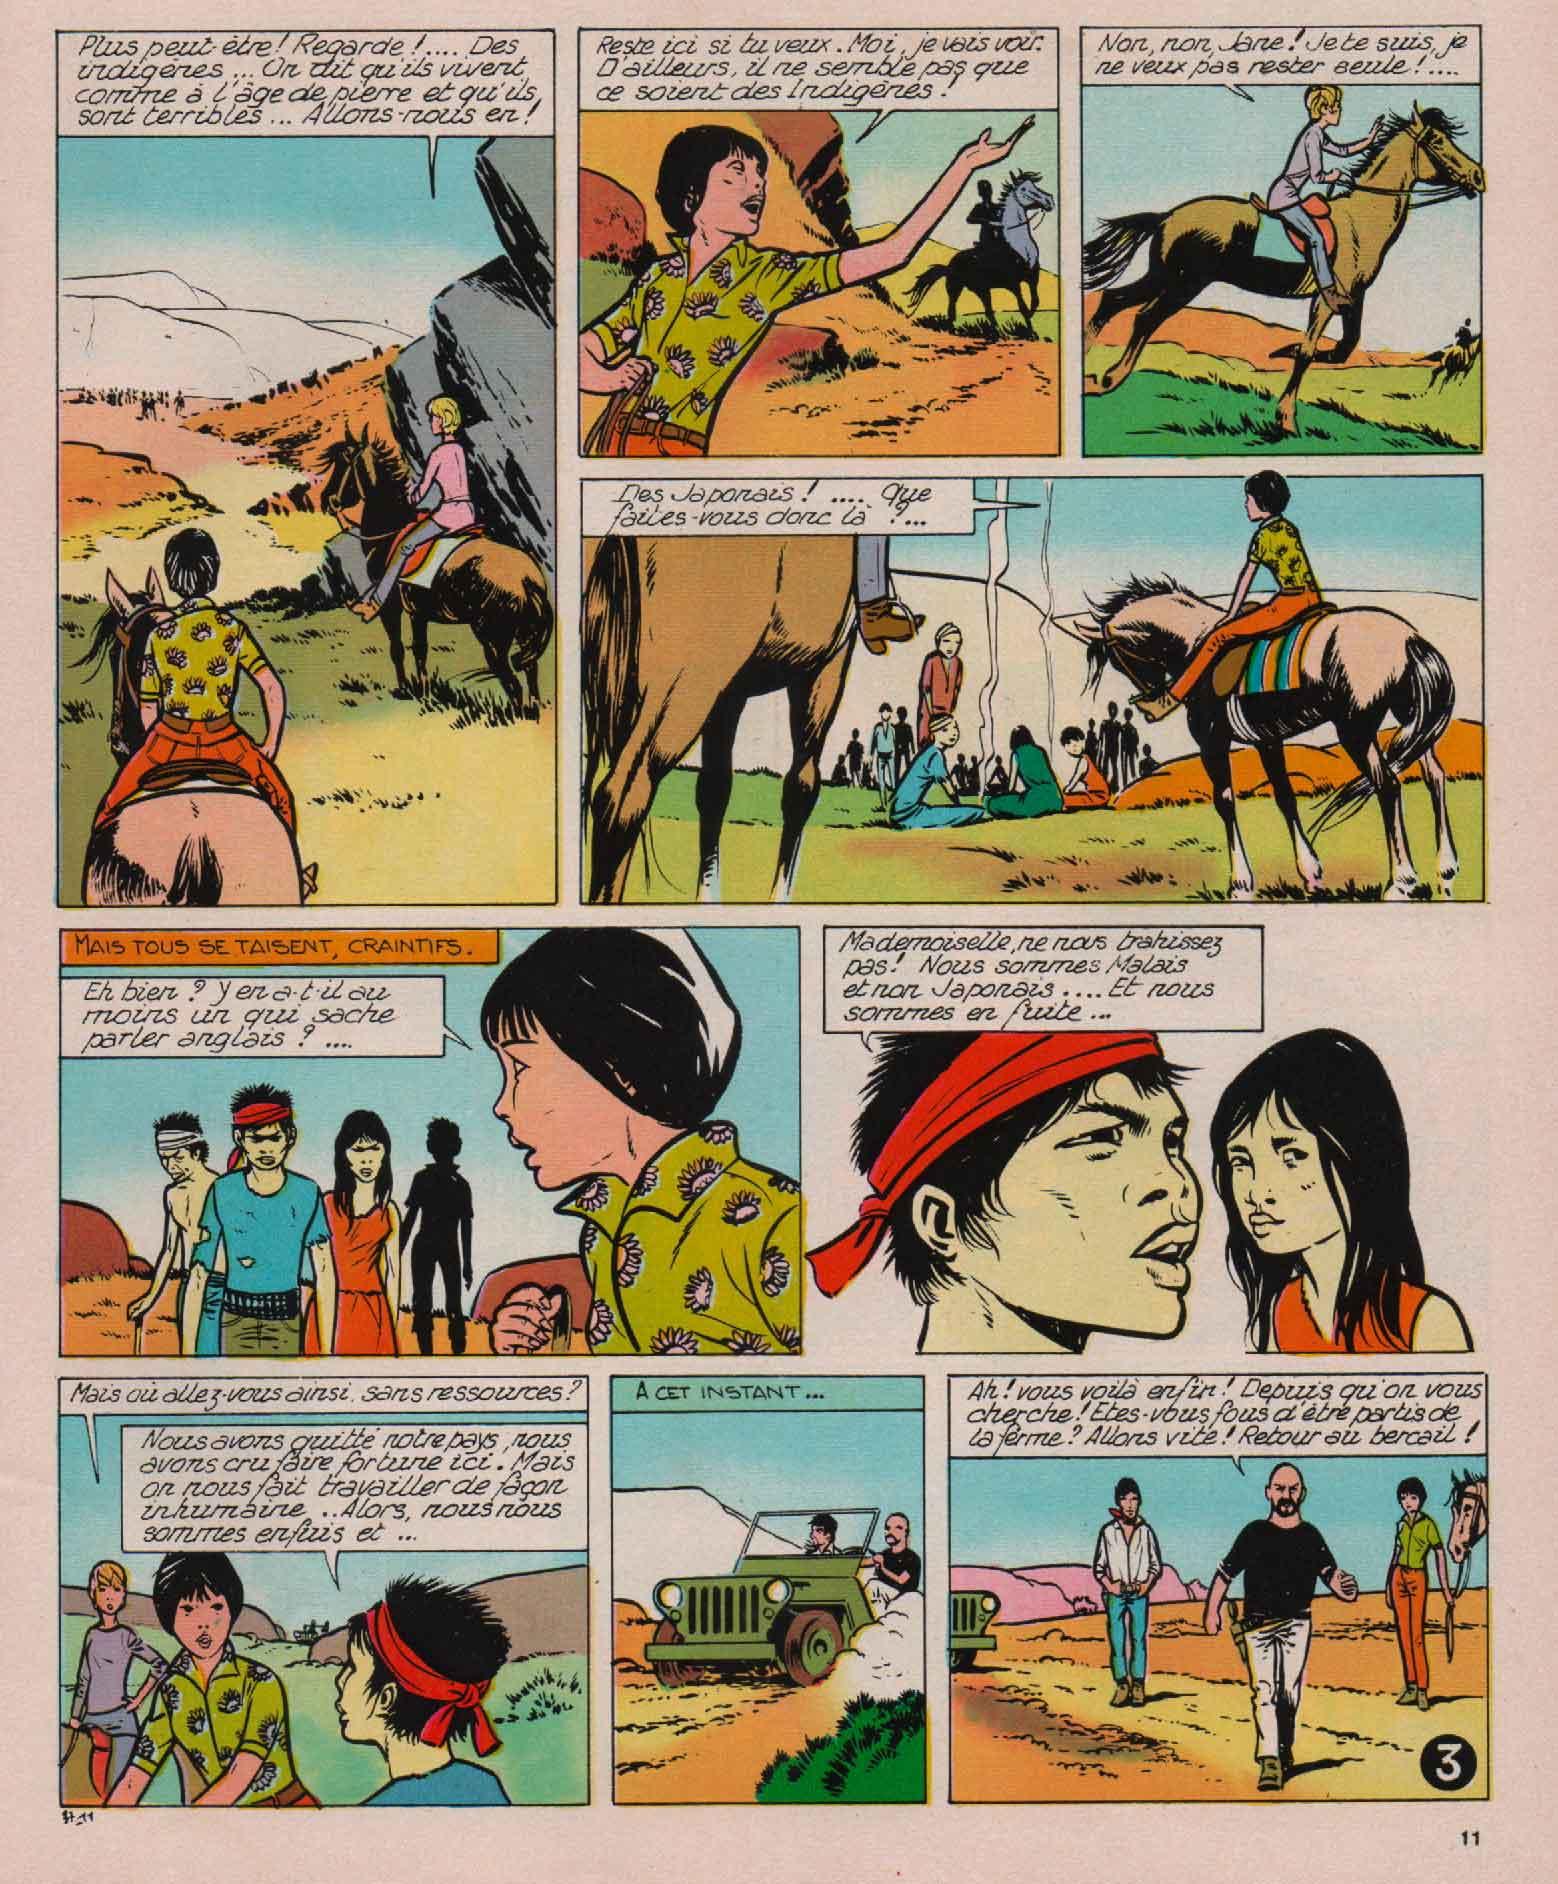 « Flower Jane » J2 magazine n° 38 (17/09/1970).